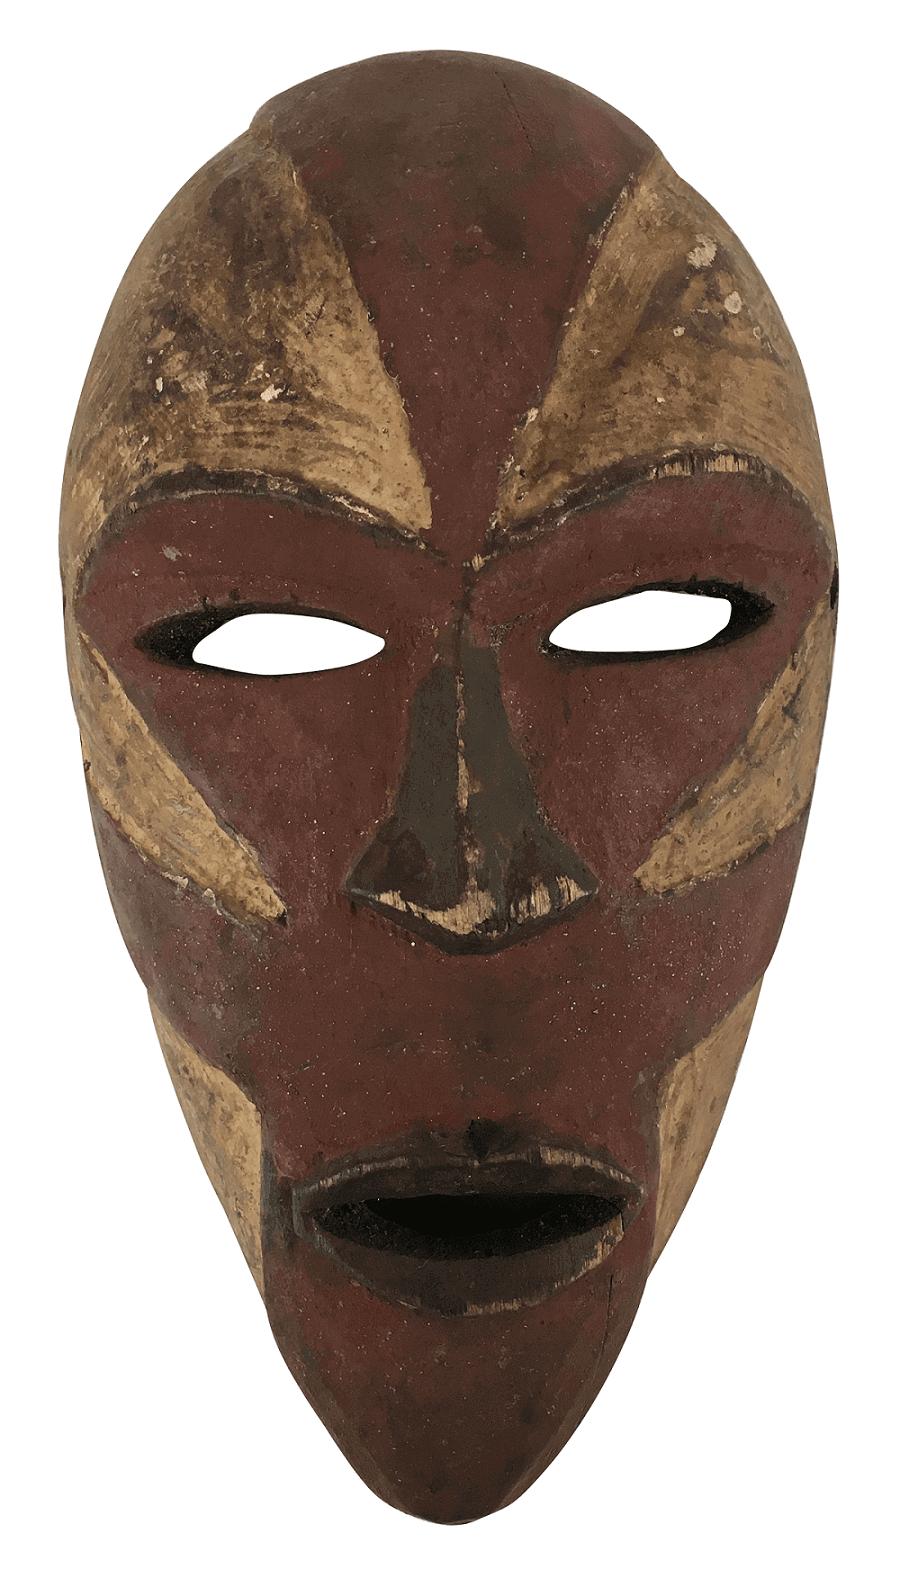 Mascara Decorativa Antiga Africana Em Madeira